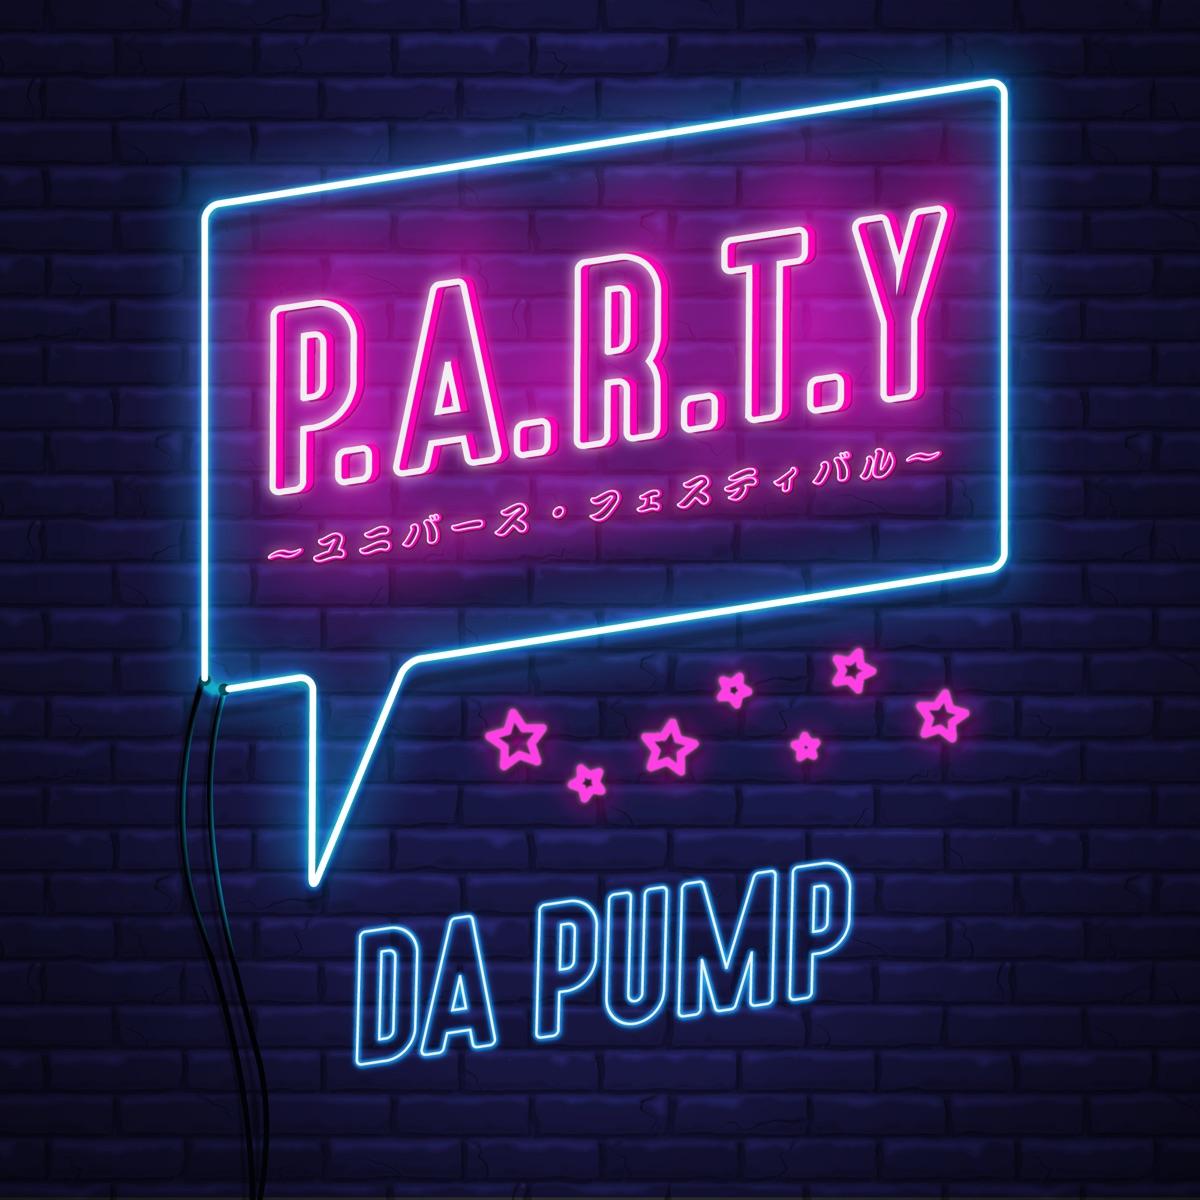 『DA PUMP - P.A.R.T.Y. ~ユニバース・フェスティバル~』収録の『P.A.R.T.Y. ~ユニバース・フェスティバル~』ジャケット